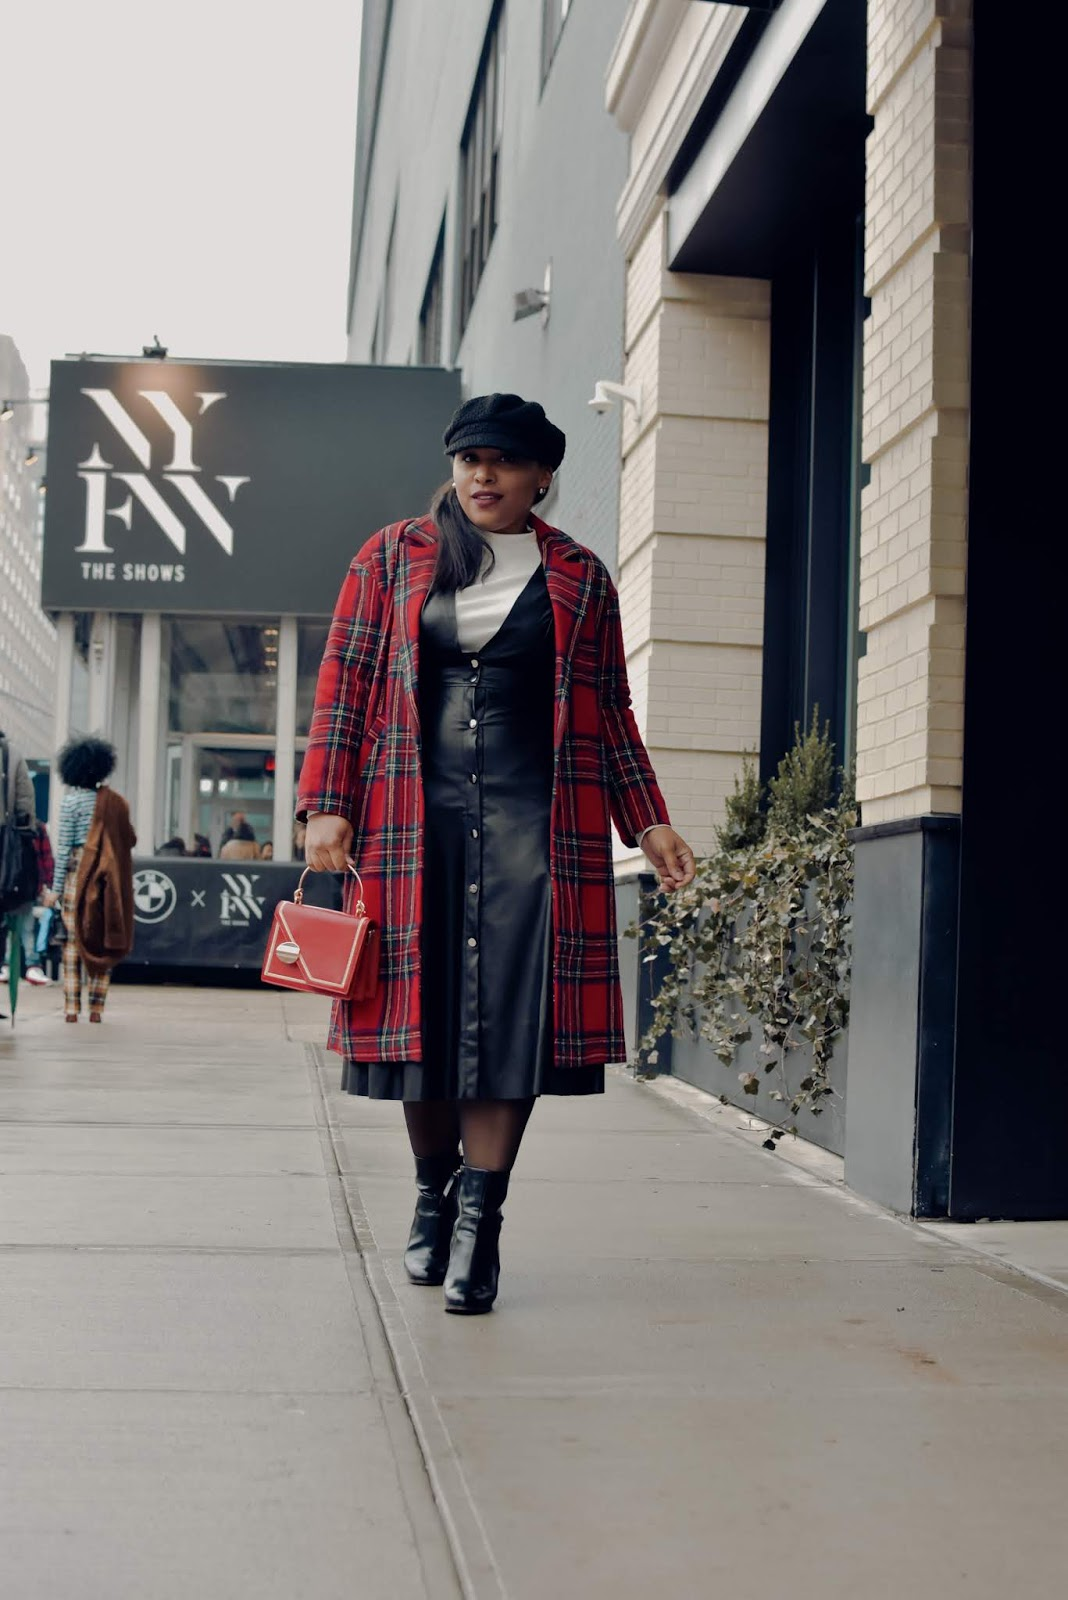 nyfw, nyfwstreetstyle, fashion hong kong, oqliq, fashion hong kong nyfw, fall winter 2020 trends, fashion week, nyfw20